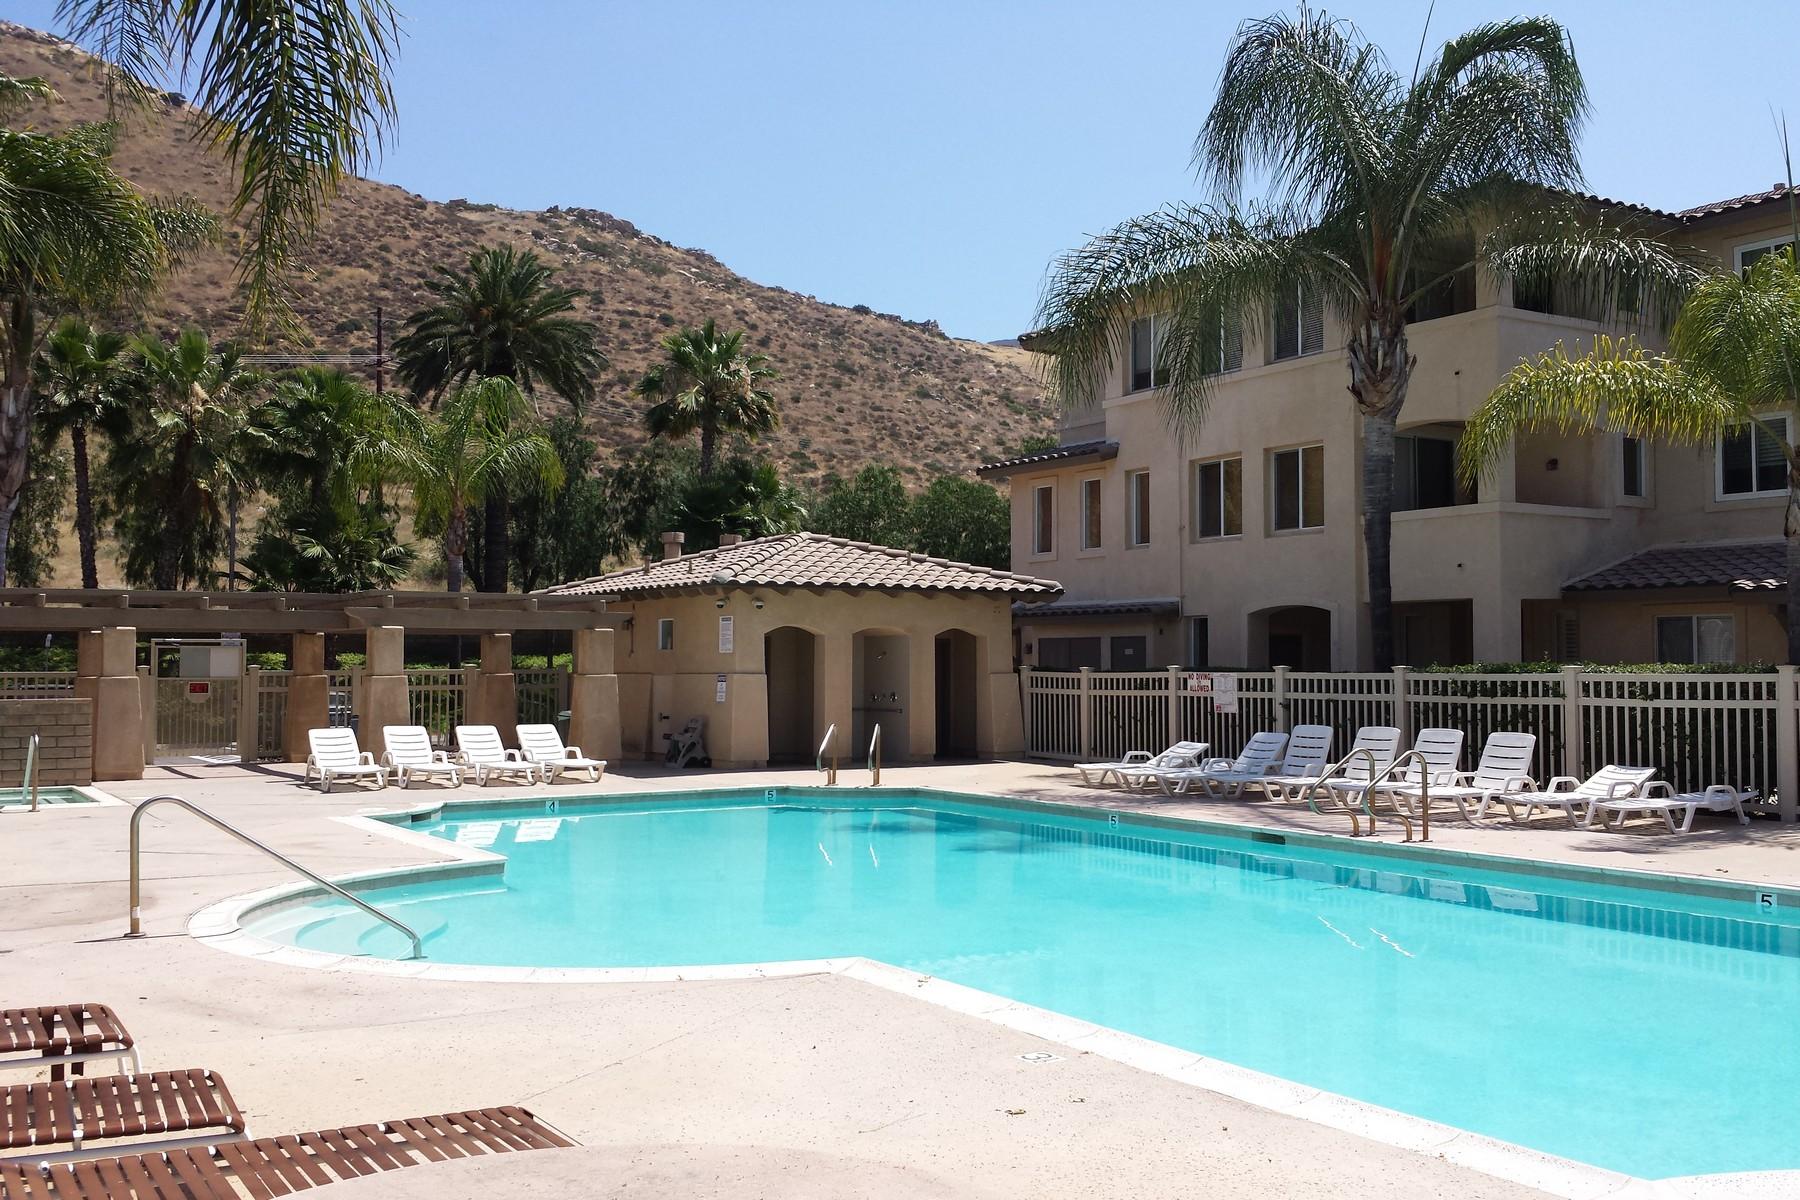 Property For Sale El Cajon